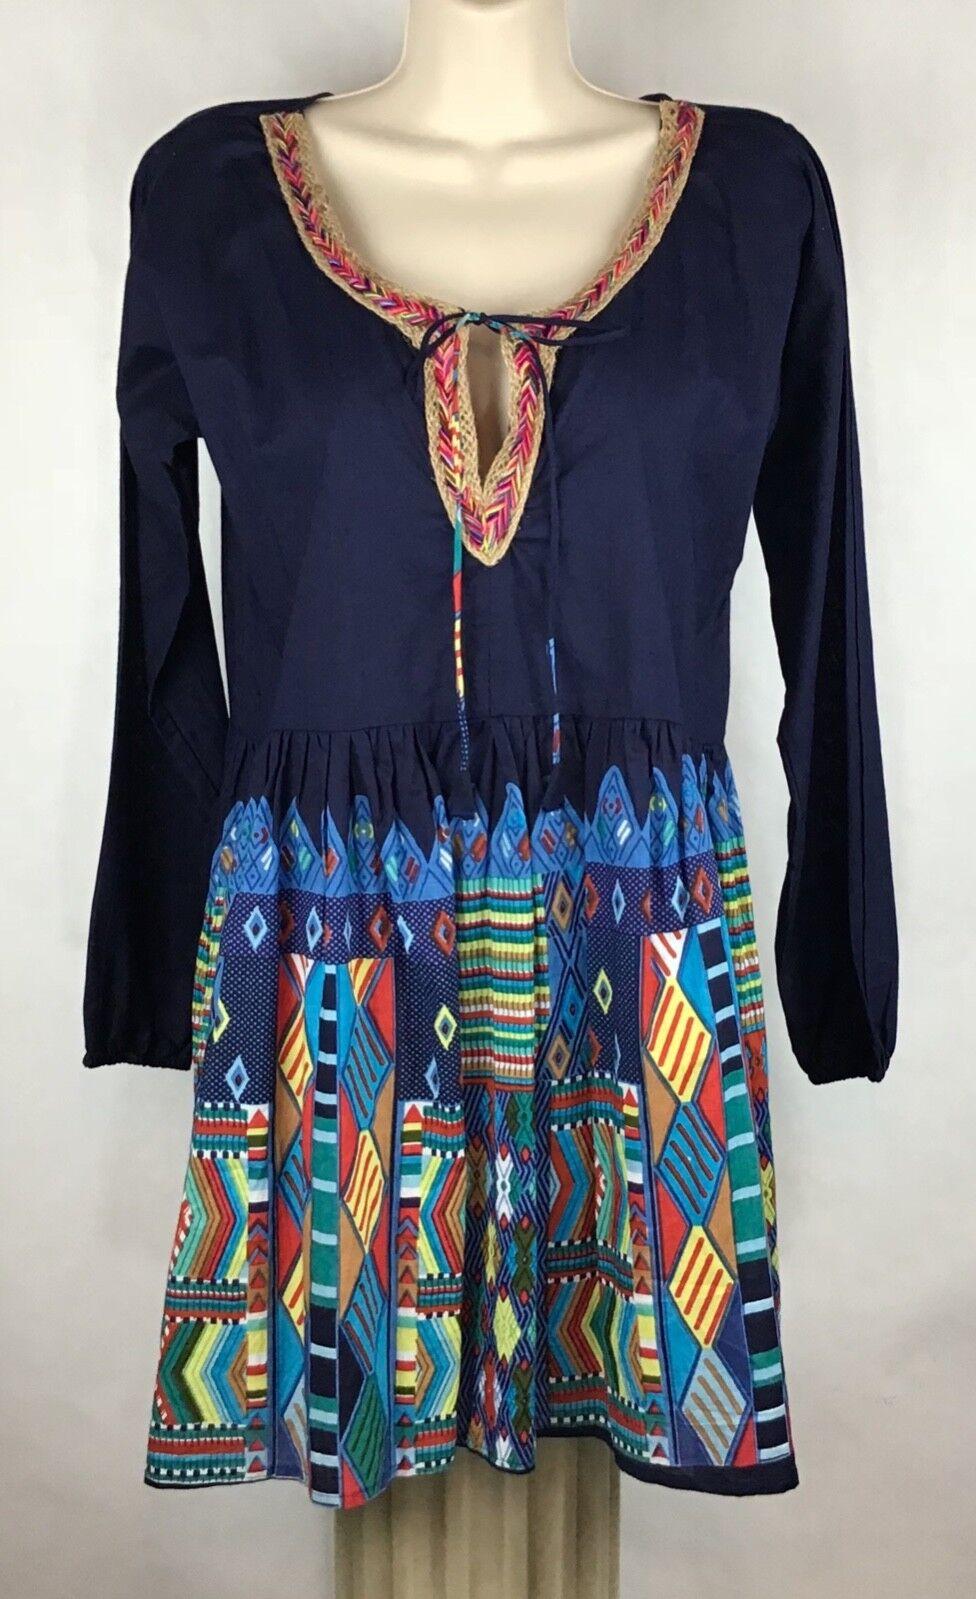 Velzera Womens M Tunic Top BOHO Babydoll Peasant Blouse Keyhole Tie Front A27-25